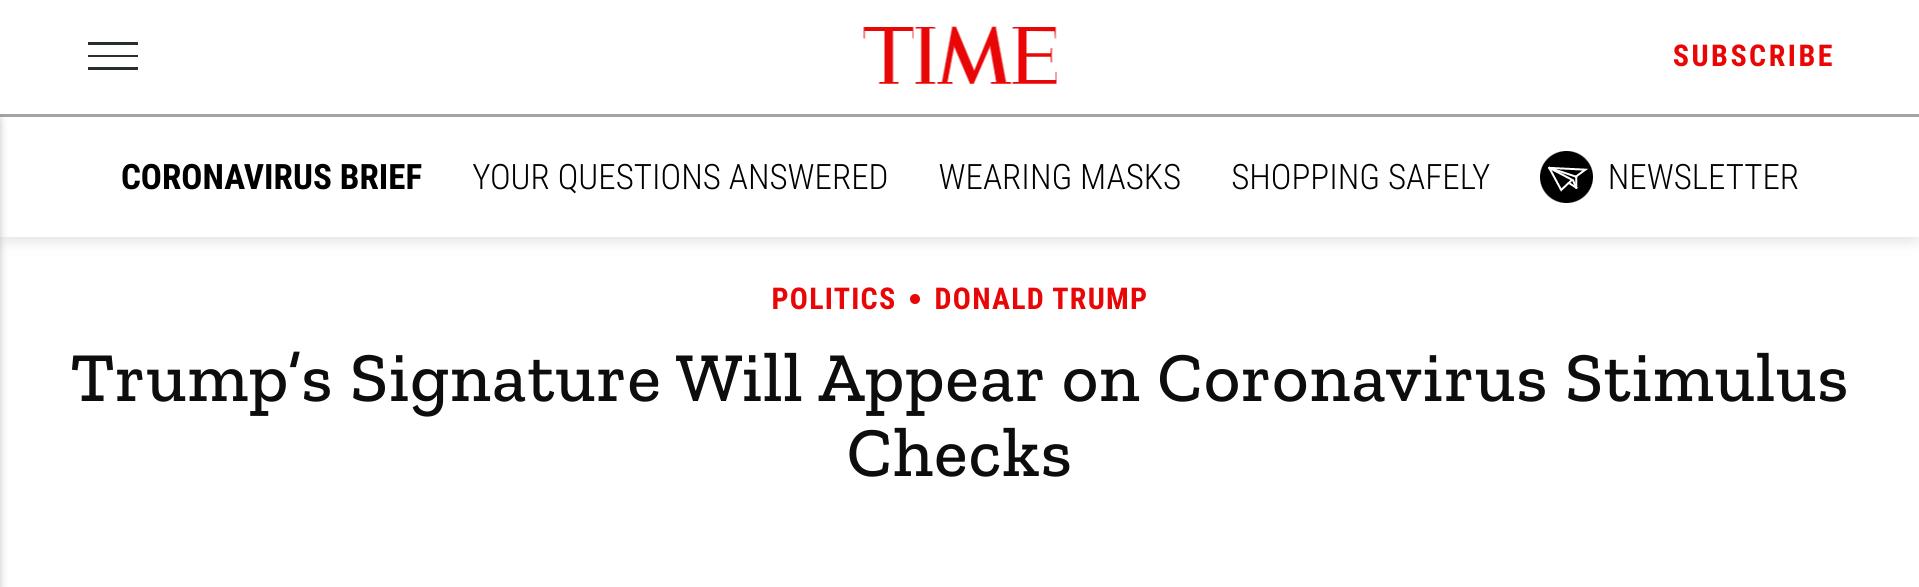 time.com Trump's Signature Will Appear on Coronavirus Stimulus Checks